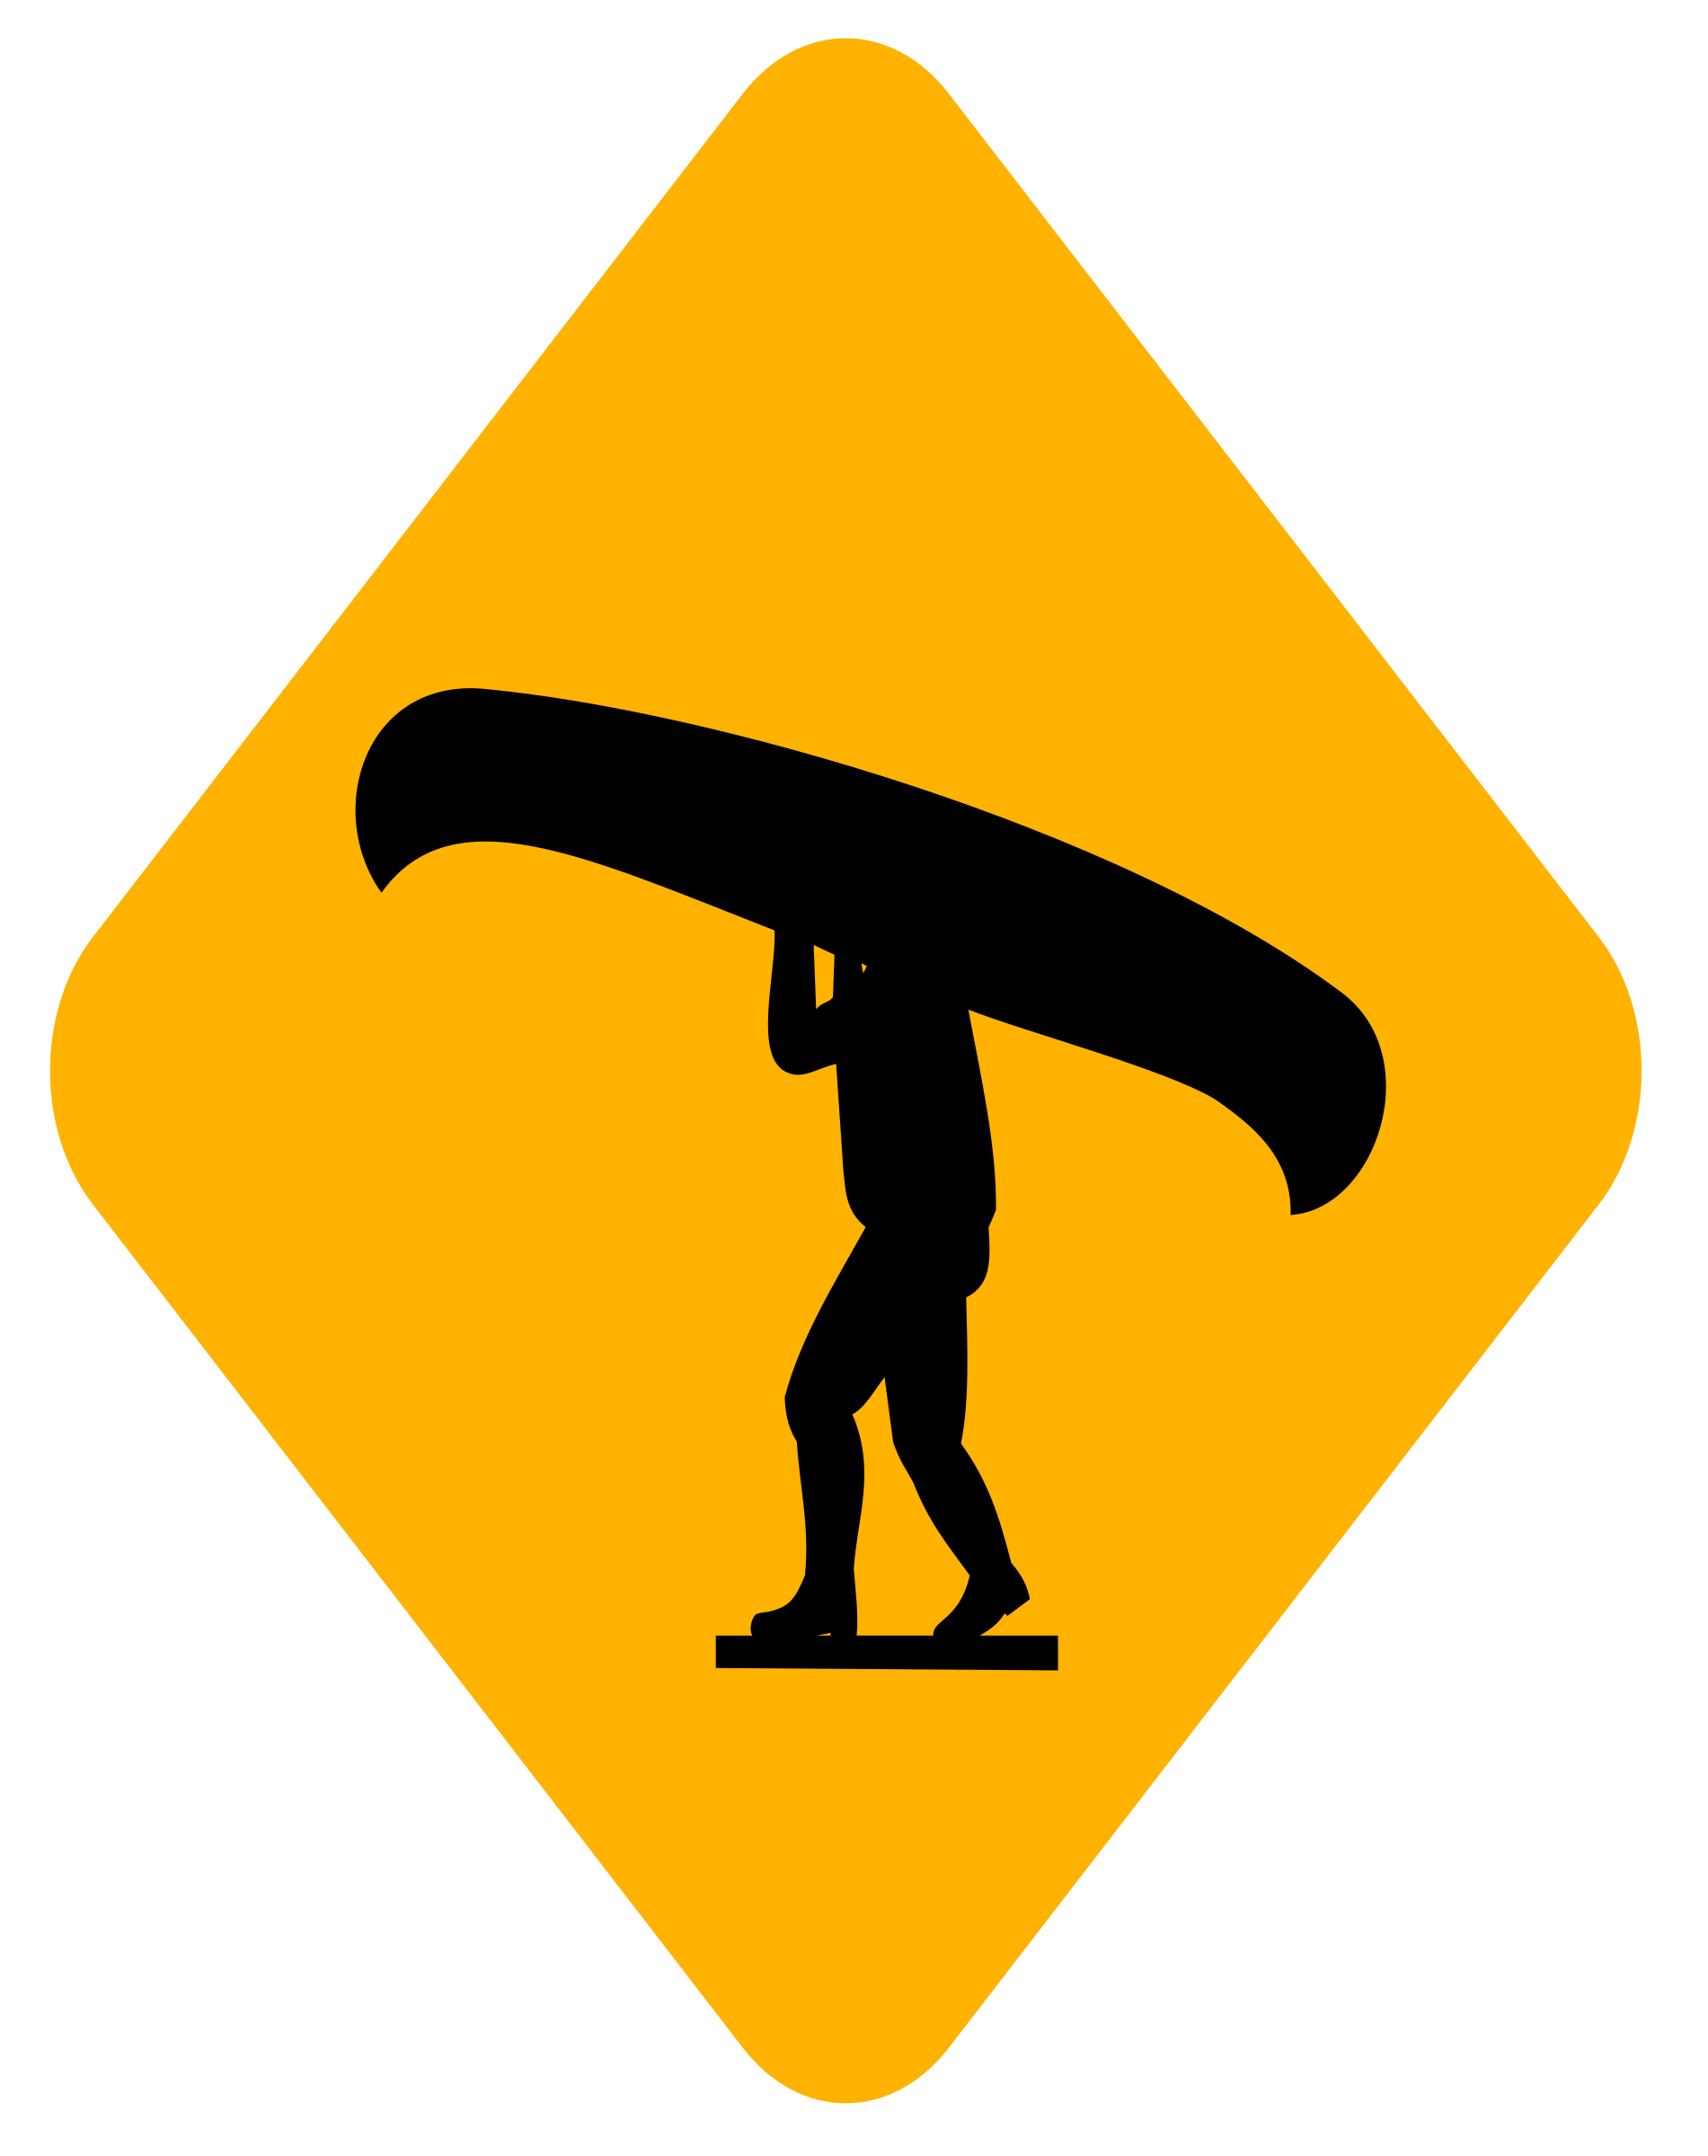 Clipart diamond sign. Portage big image png